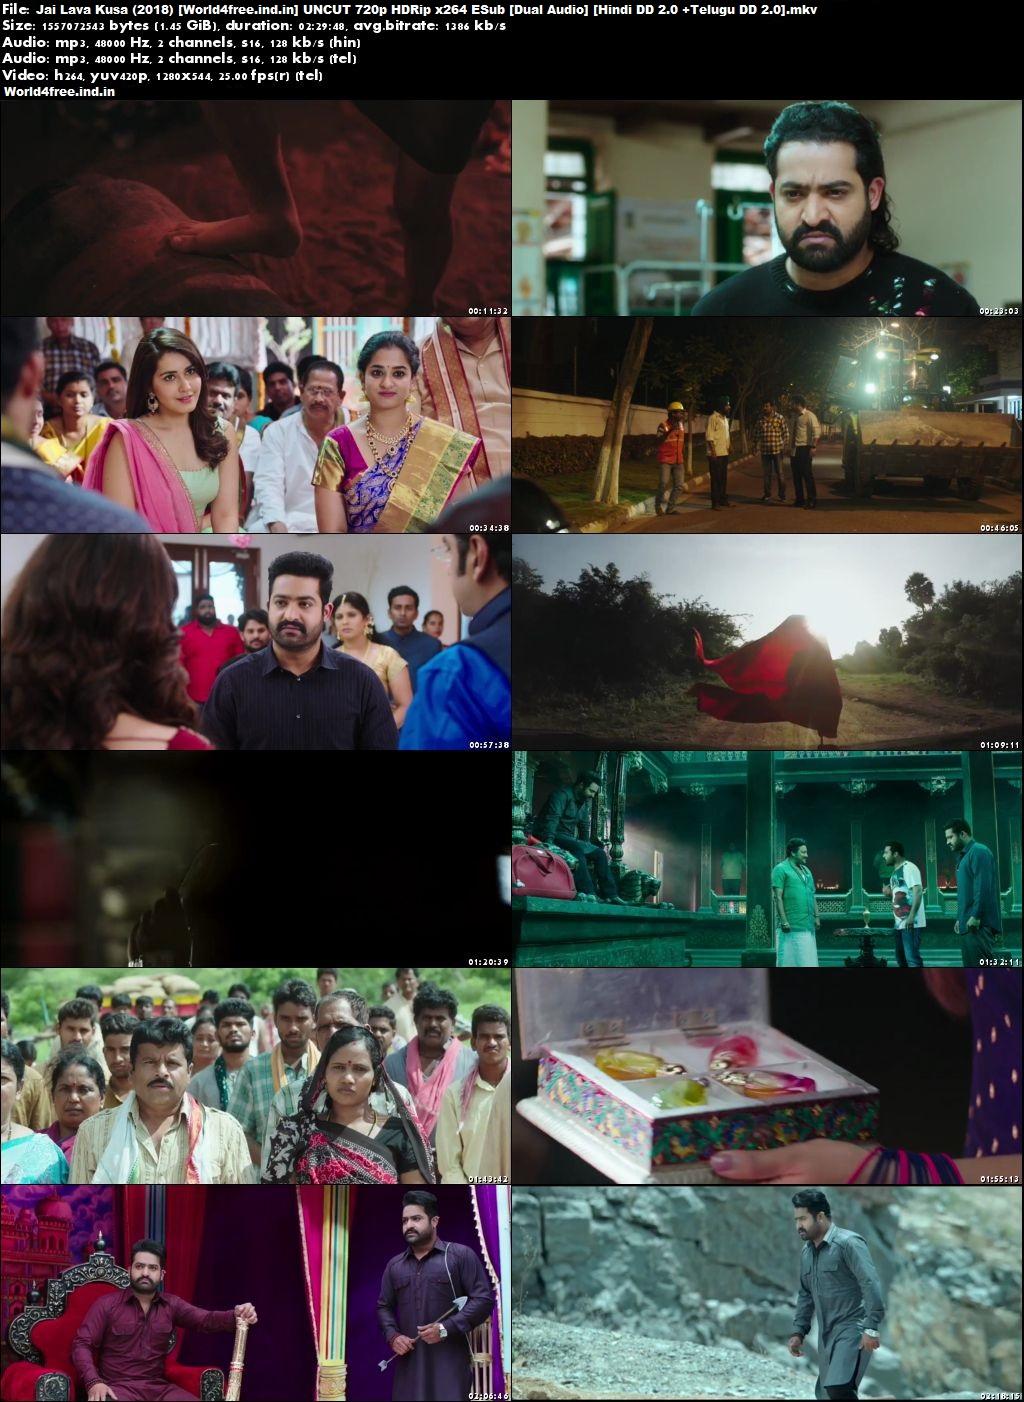 Jai Lava Kusa 2017 world4free.ind.in Hindi Dubbed Movie Download HDRip 720p Download